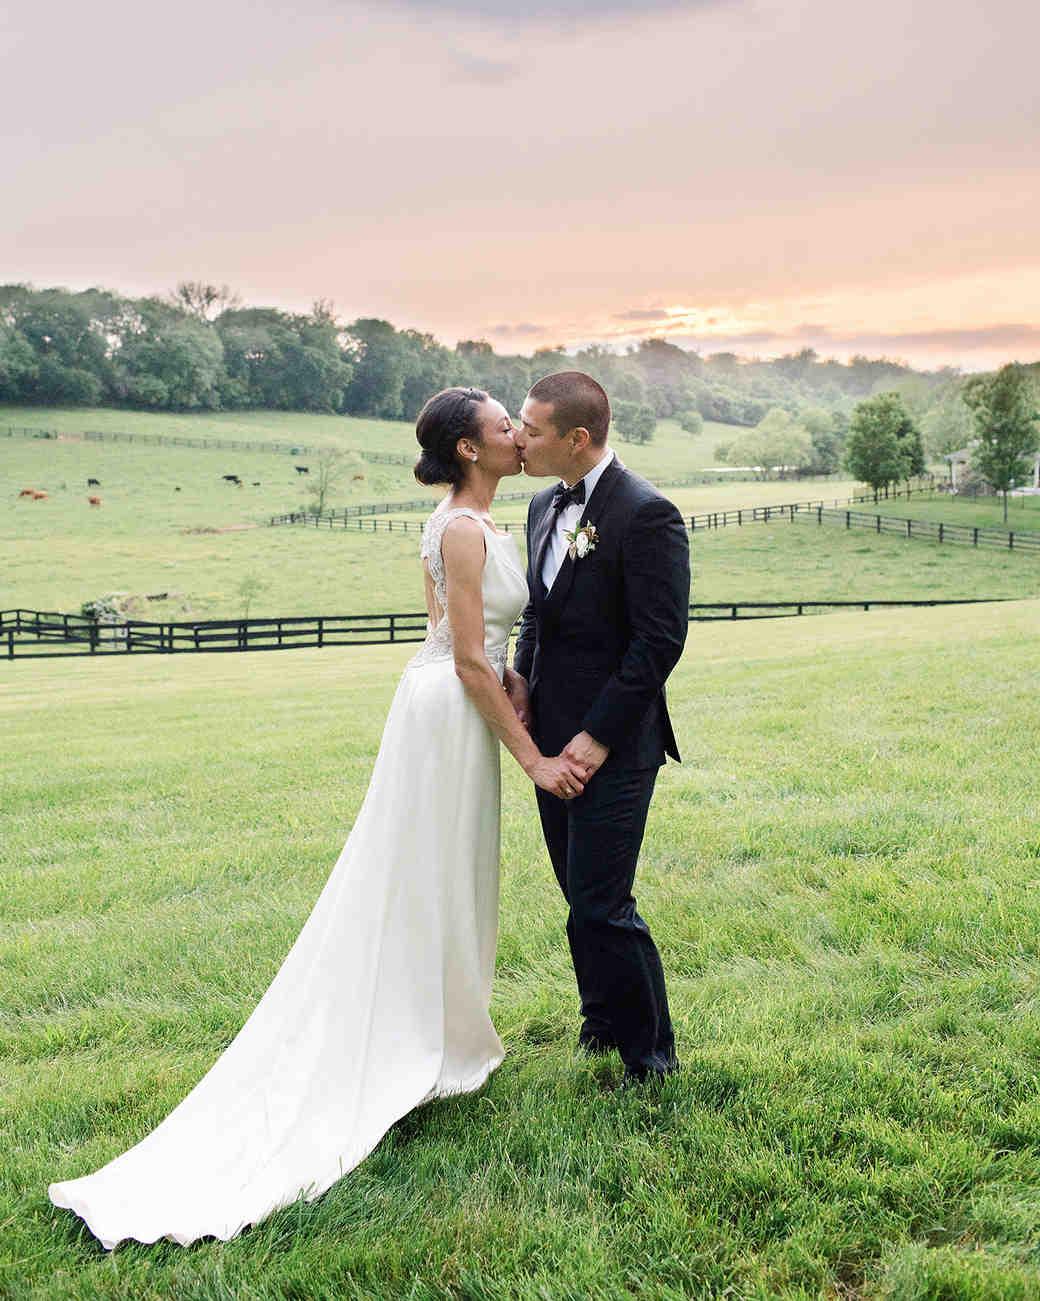 pillar paul wedding couple rolling hills with sunset